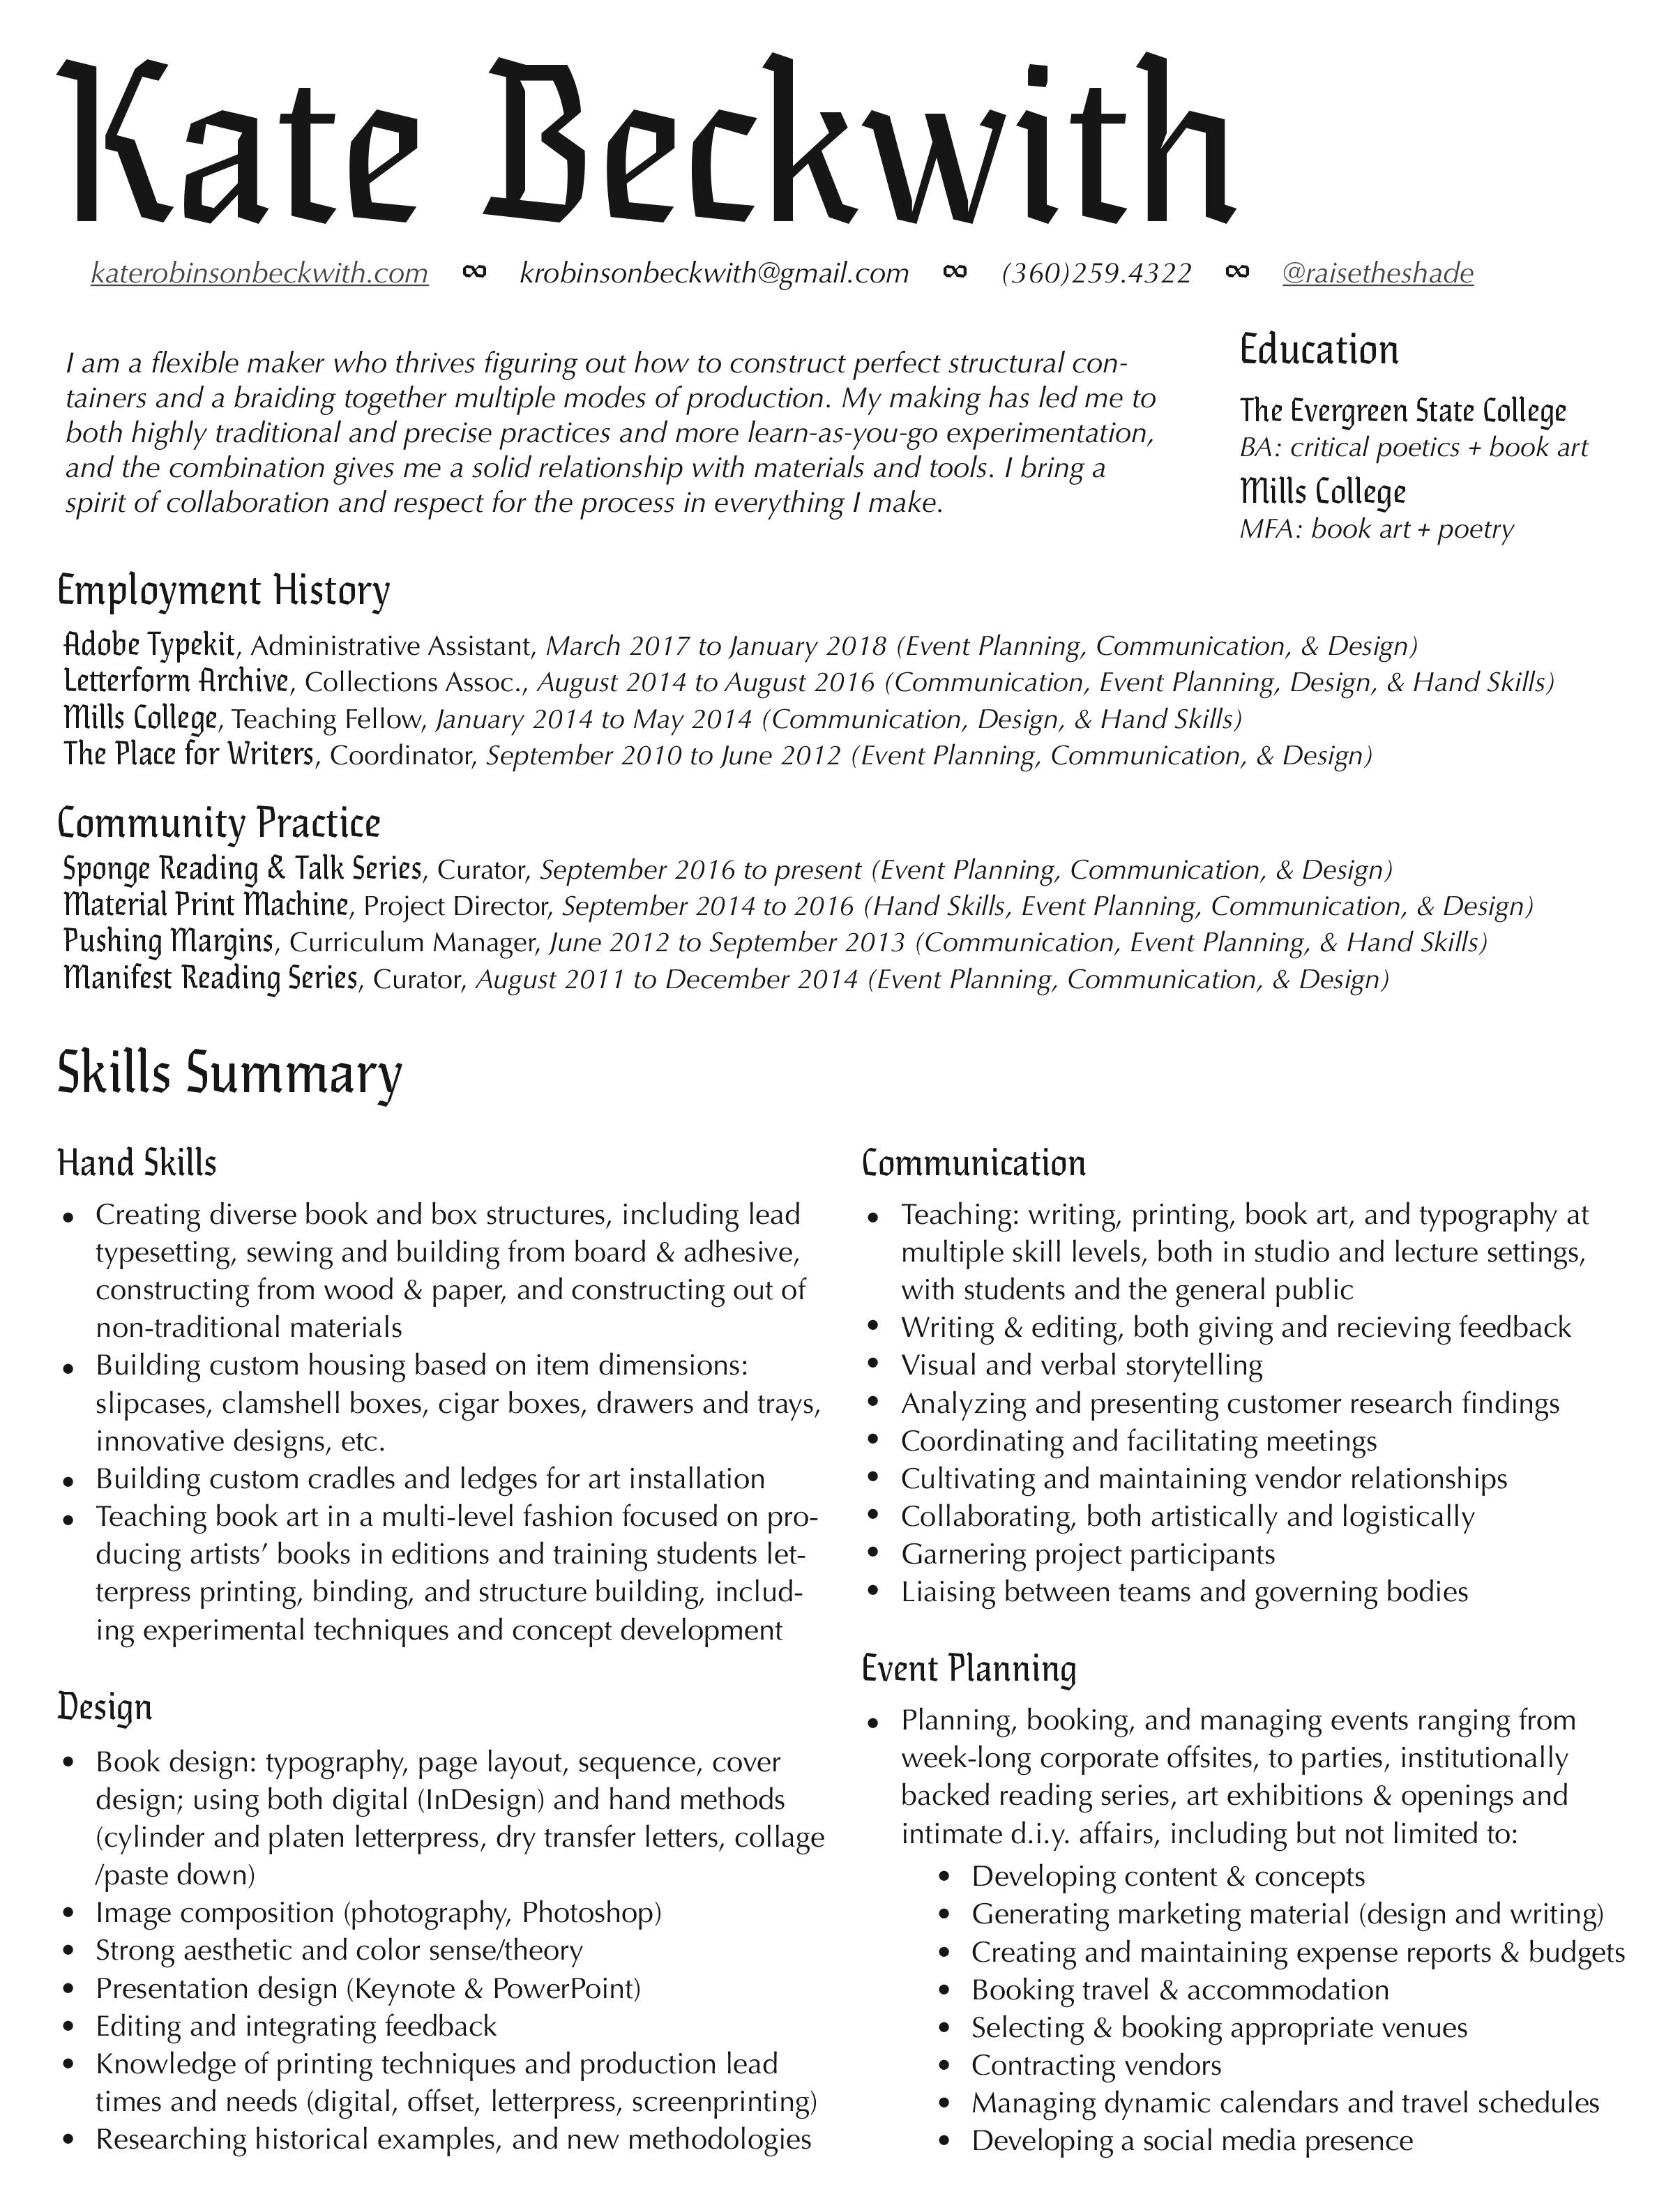 kate functional resume maker edit.jpg